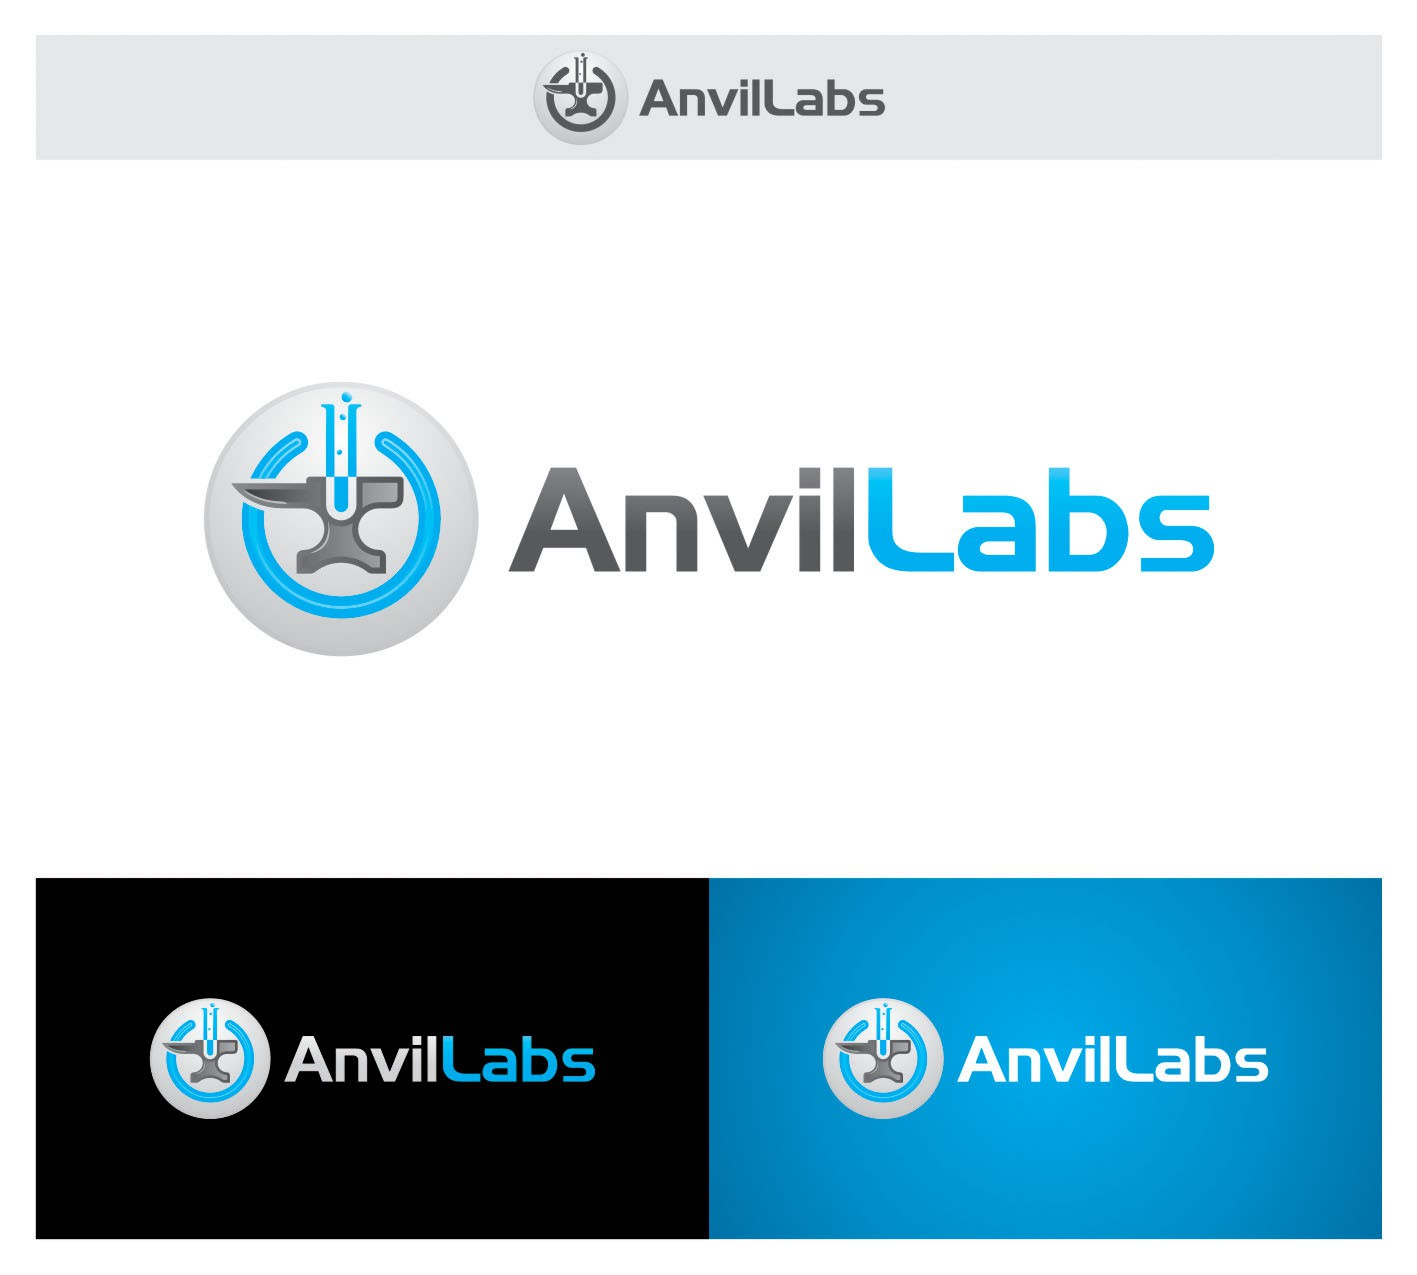 Anvil Labs needs a new logo